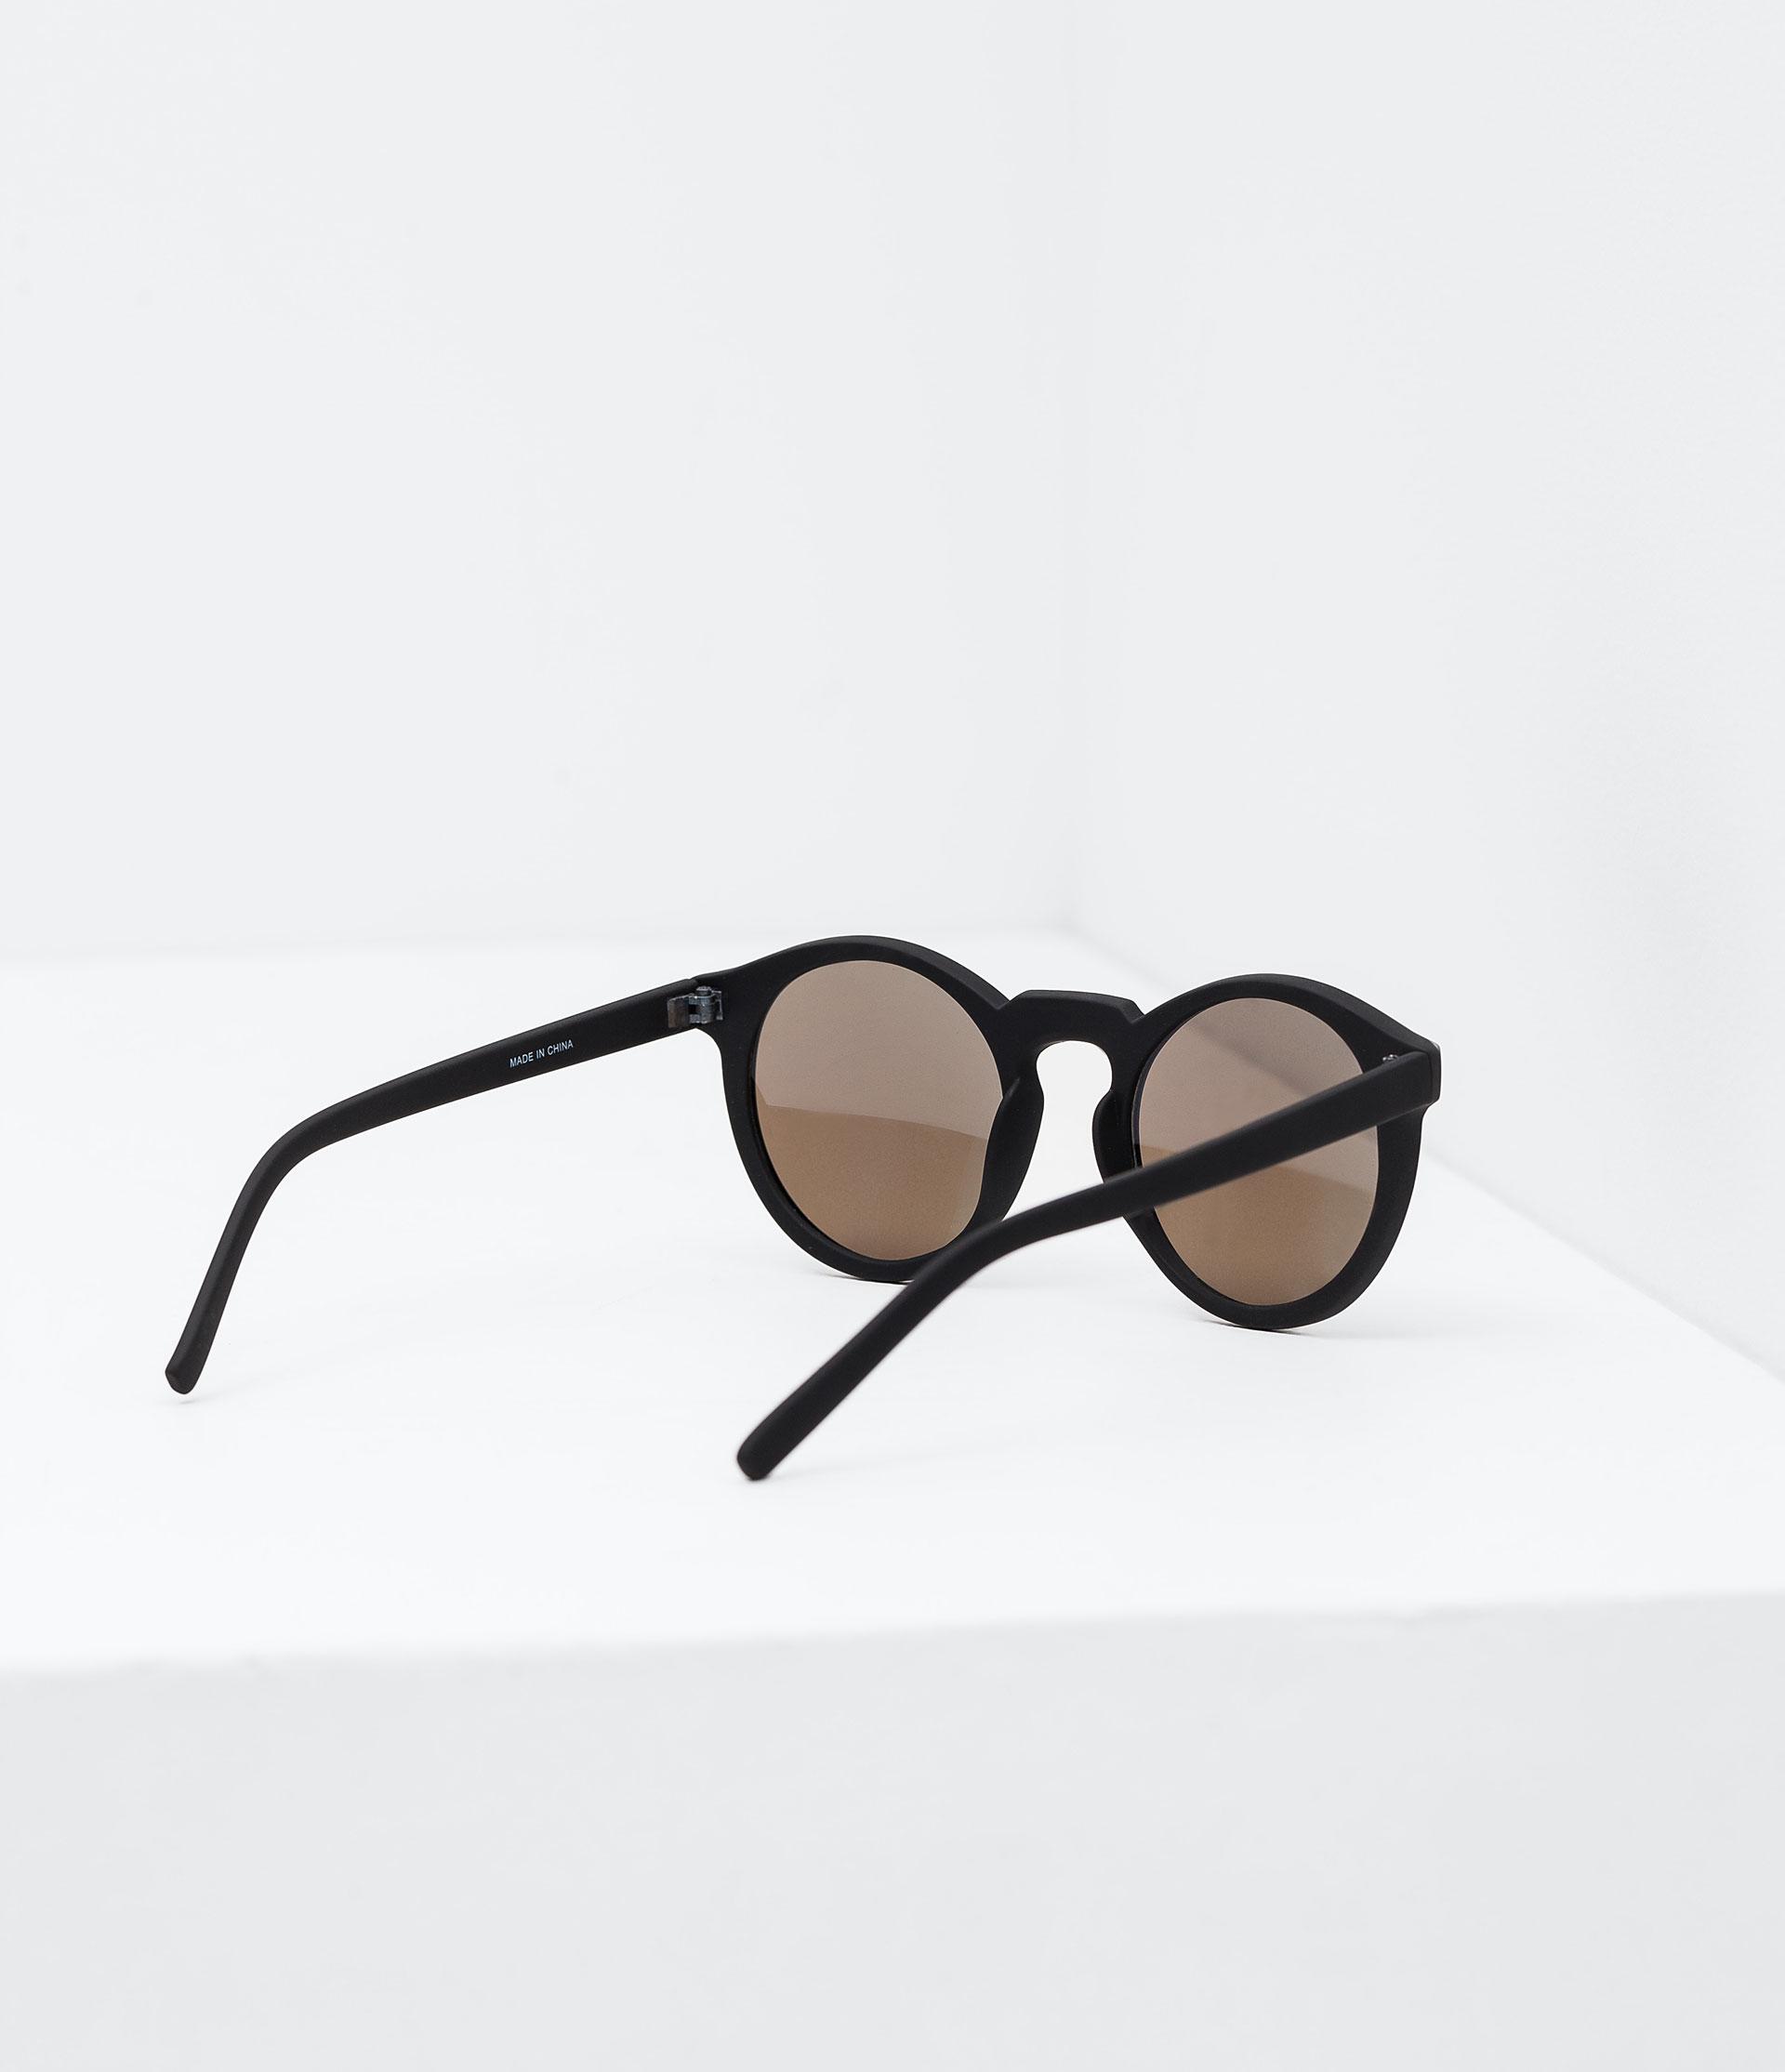 Zara Glasses Frames : Zara Sunglasses With Tortoiseshell Frame And Metallic Arms ...